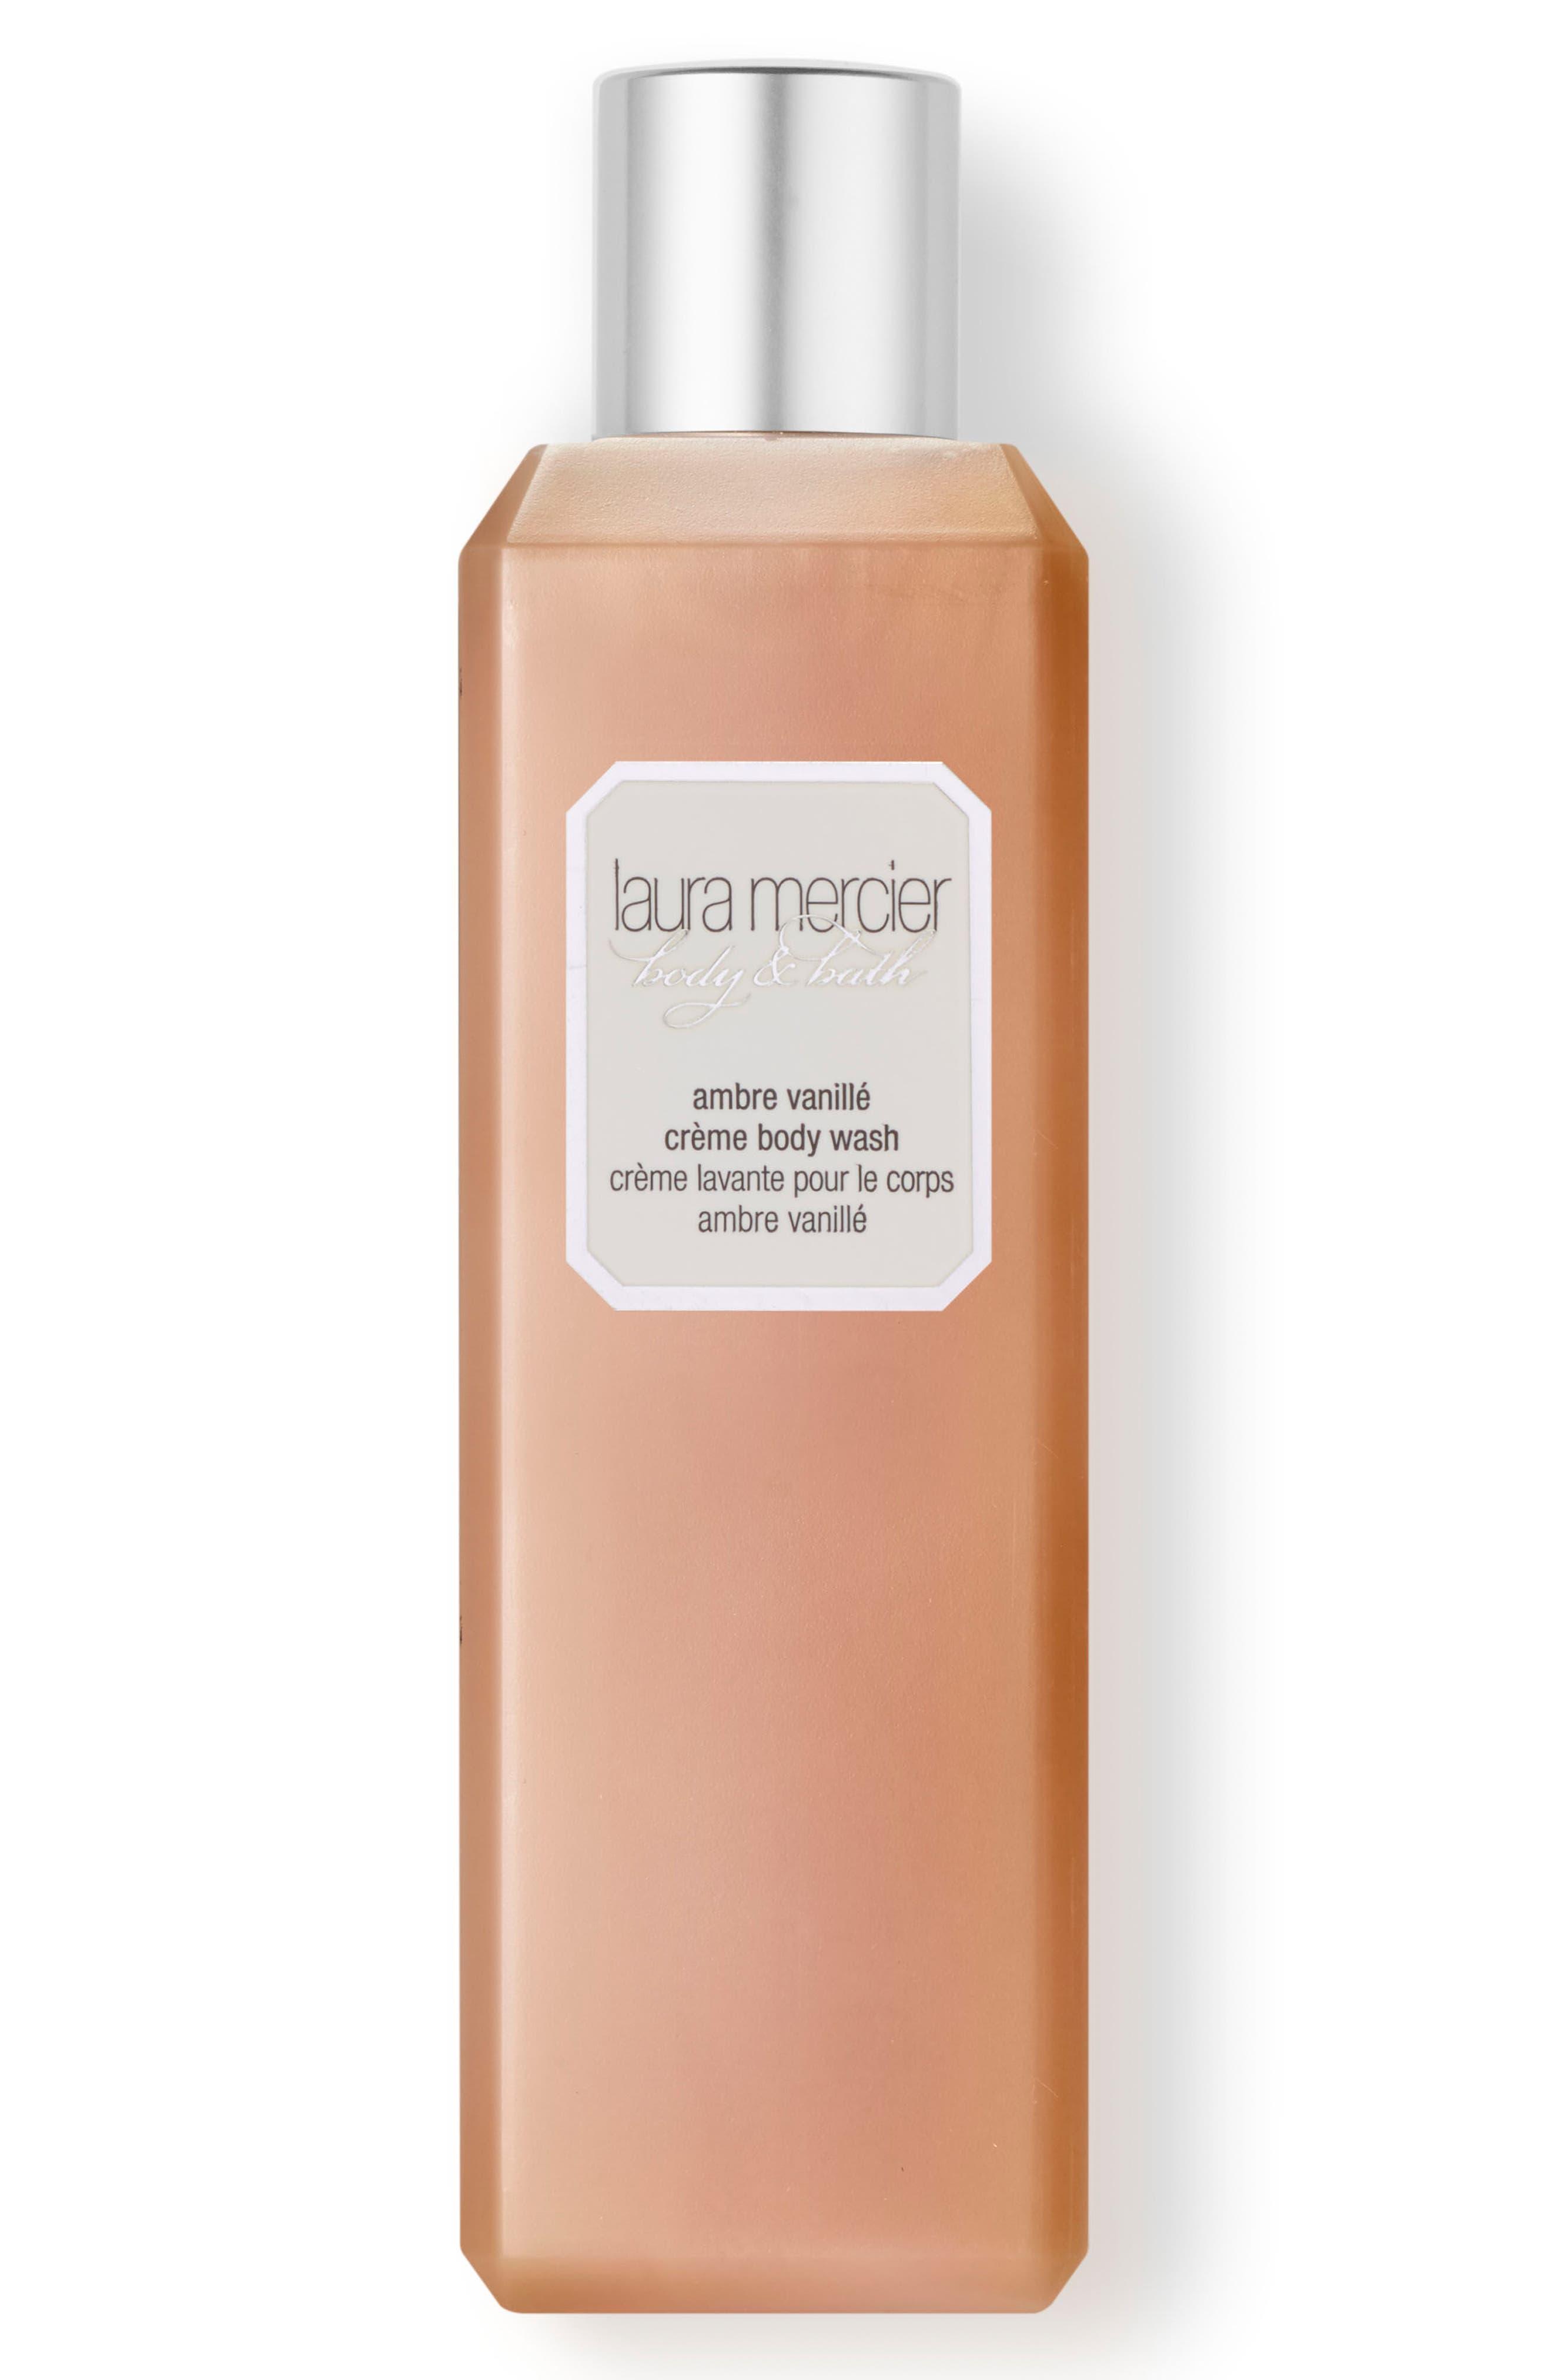 Laura Mercier 'Ambre Vanillé' Crème Body Wash